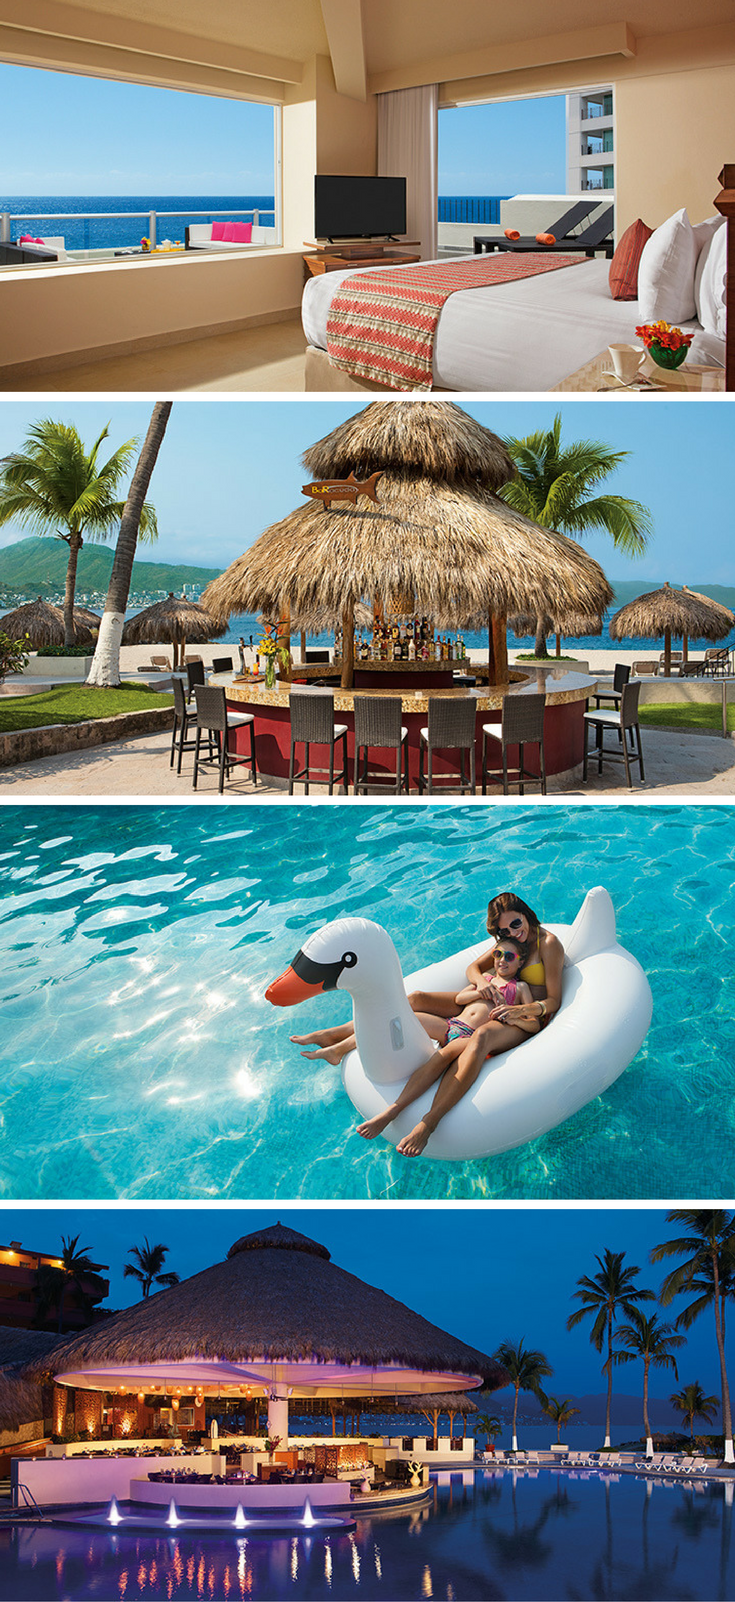 Sunscape Puerto Vallarta Resort & Spa Is Located On An Eco